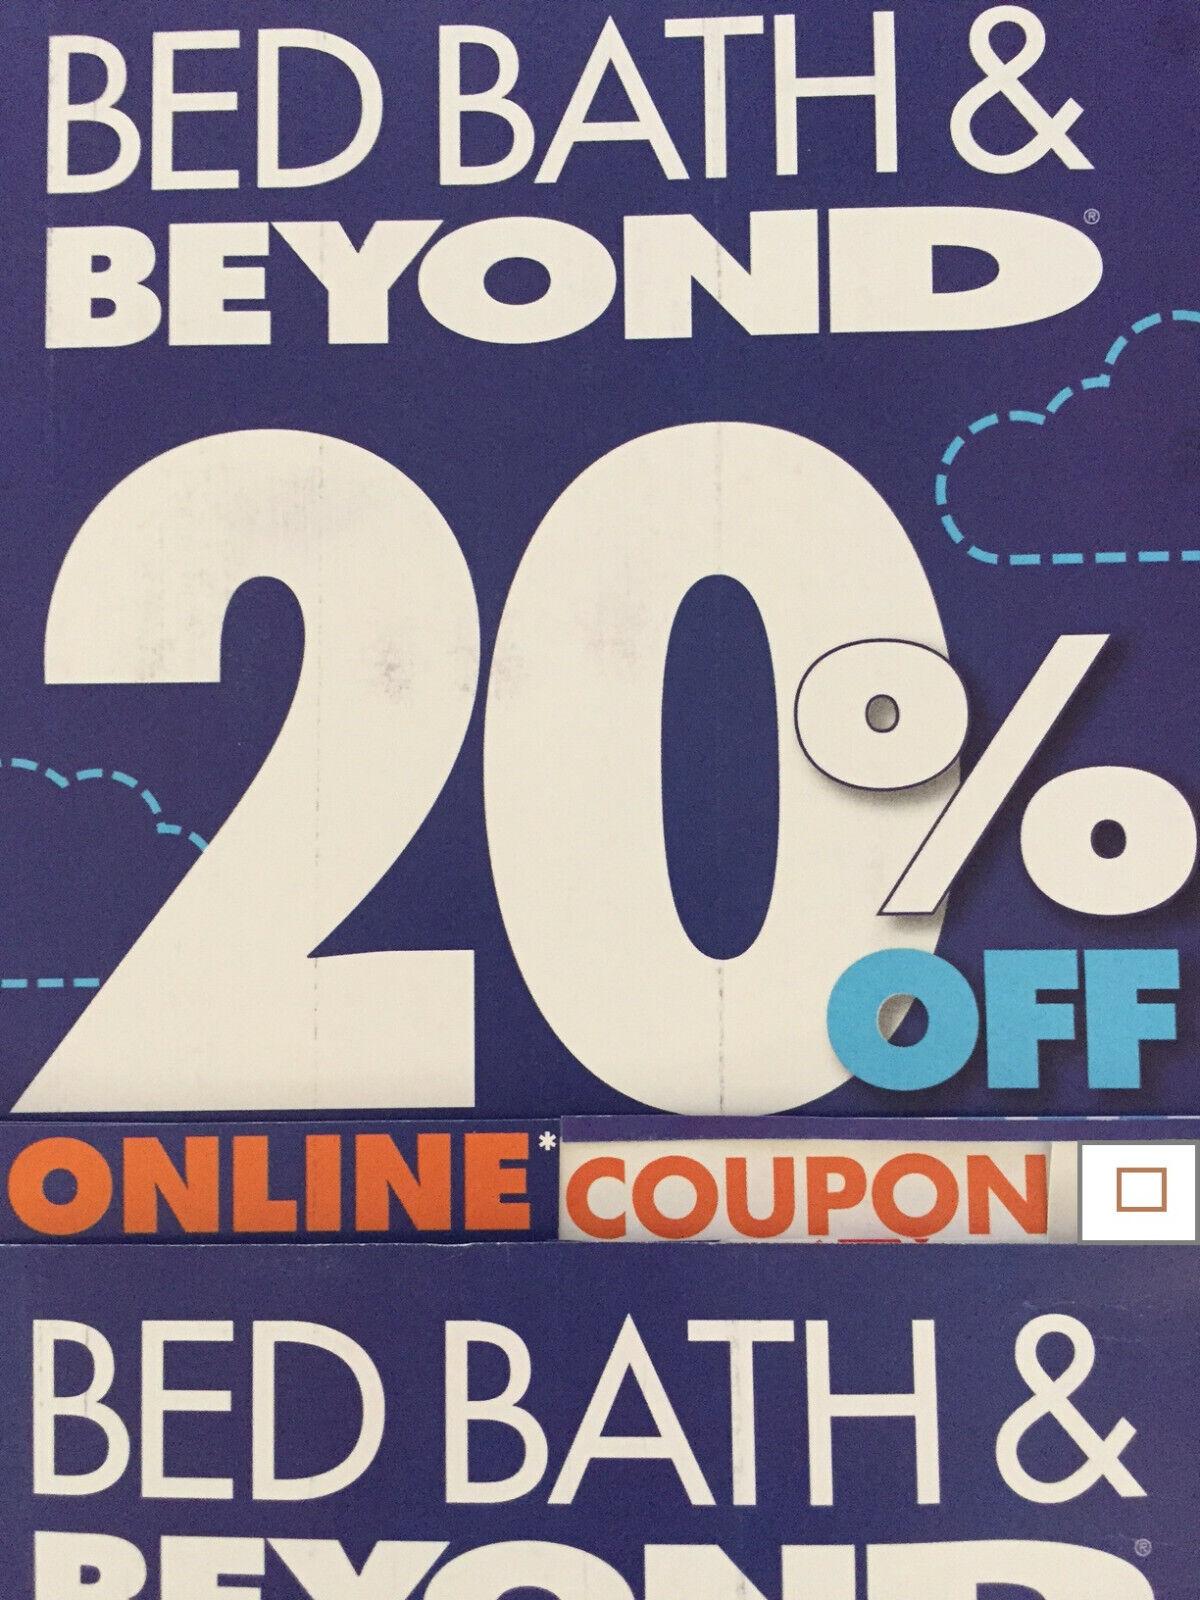 1-Bed Bath Beyond 20 Off 1 Item Online Coupon Exp 3/15/21 - $1.34